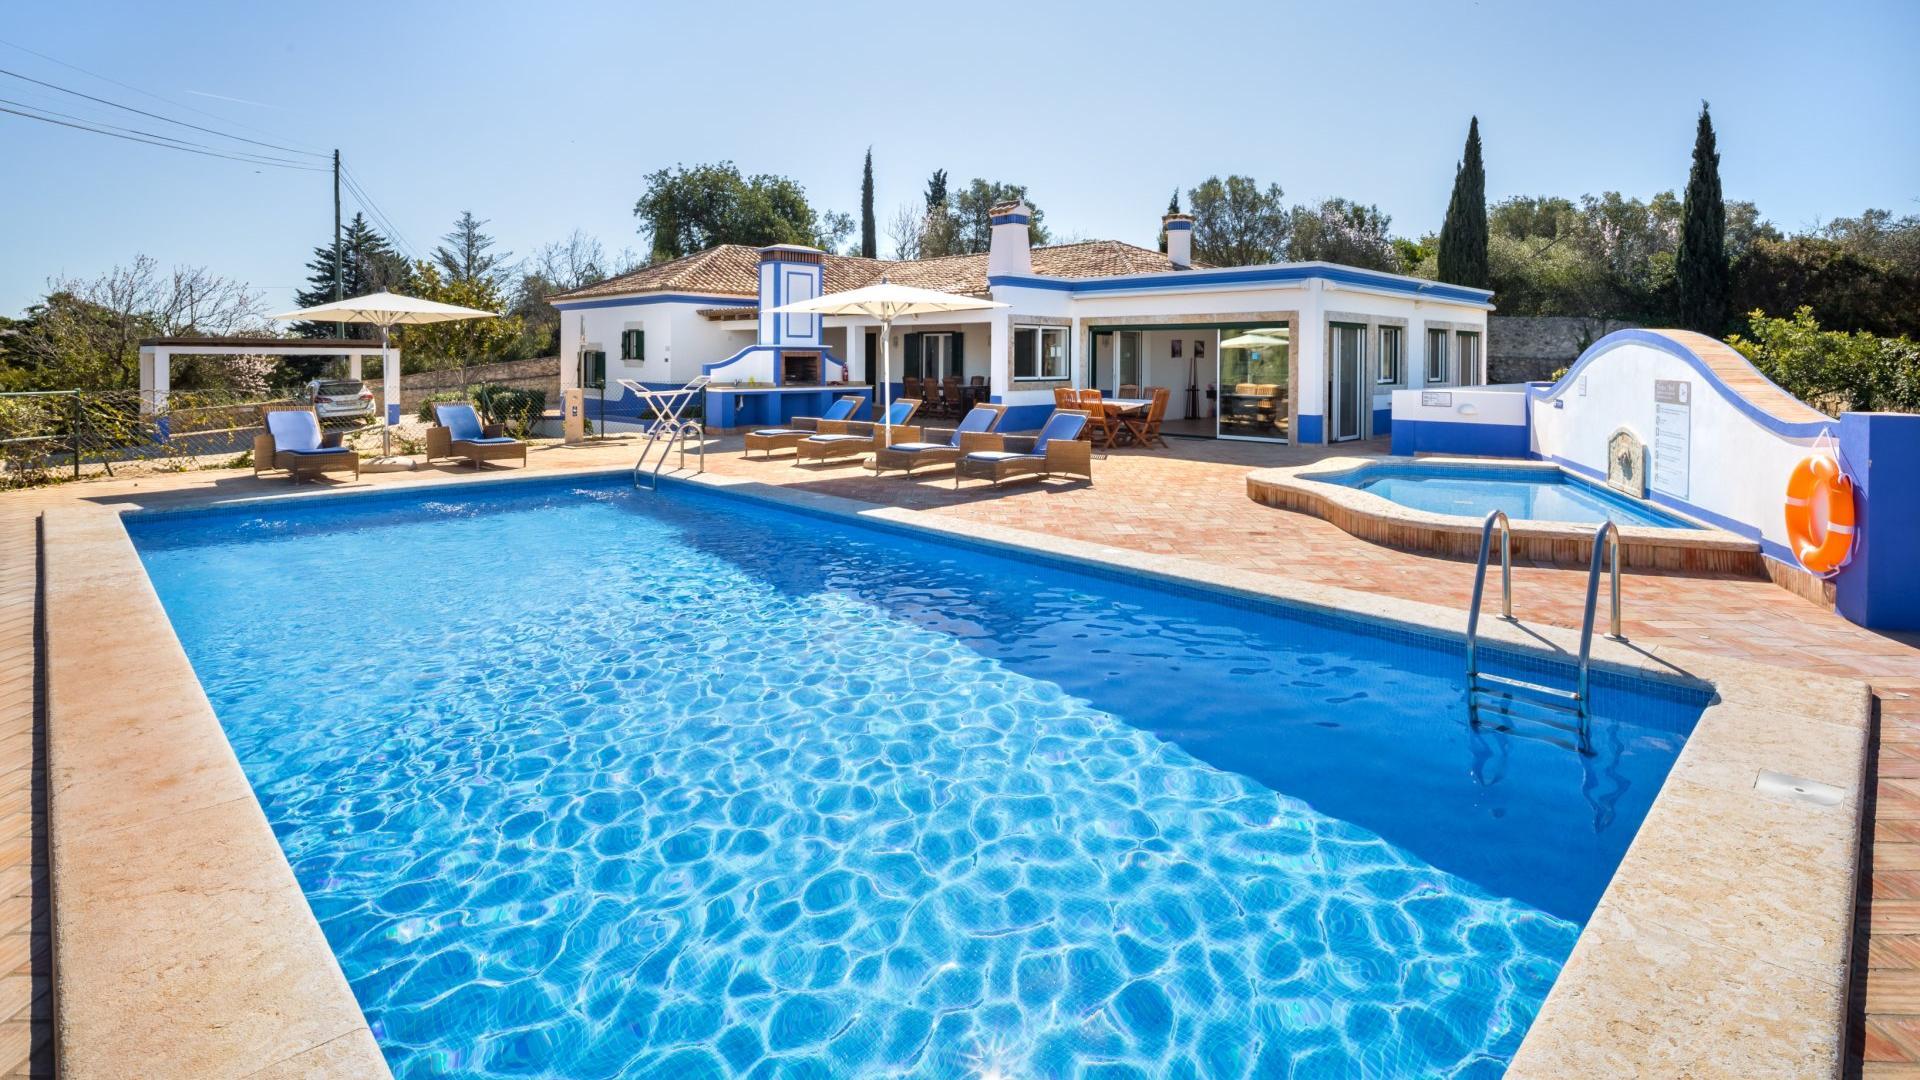 Villa Palm Tree - Boliqueime, Algarve - _55A5371-HDR.jpg